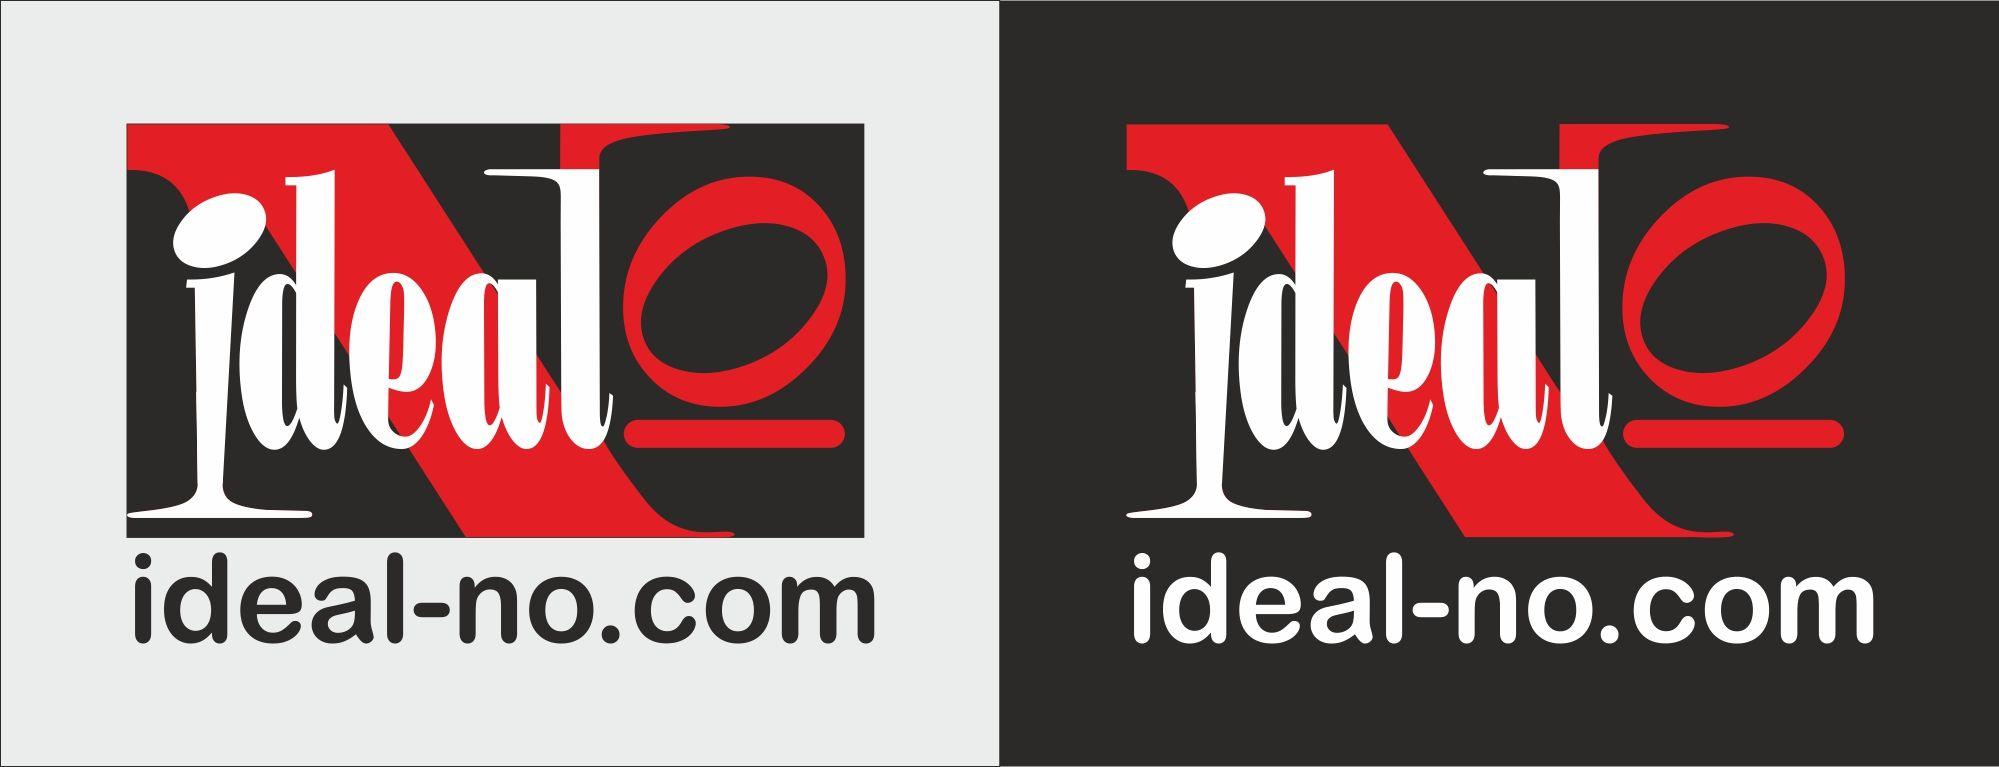 Логотип ideal-no.com - дизайнер marchelina